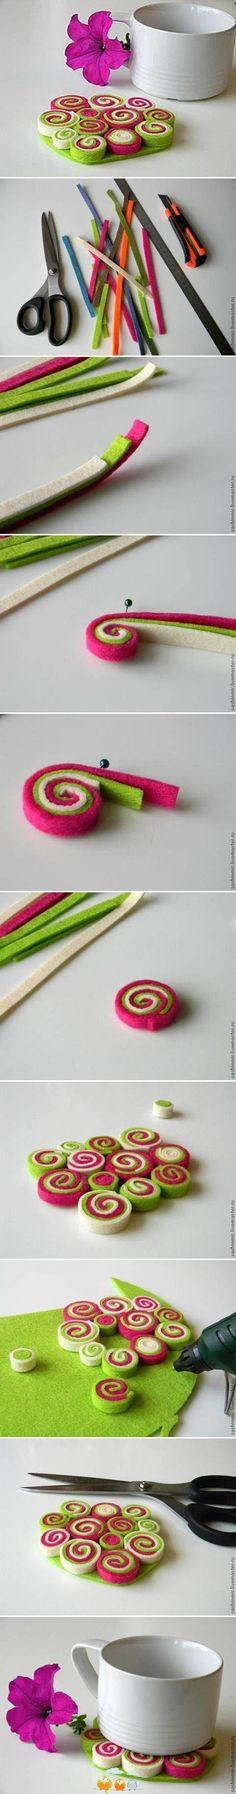 make cup mat with felt paper.Craft ideas 6297 - LC.Pandahall.com